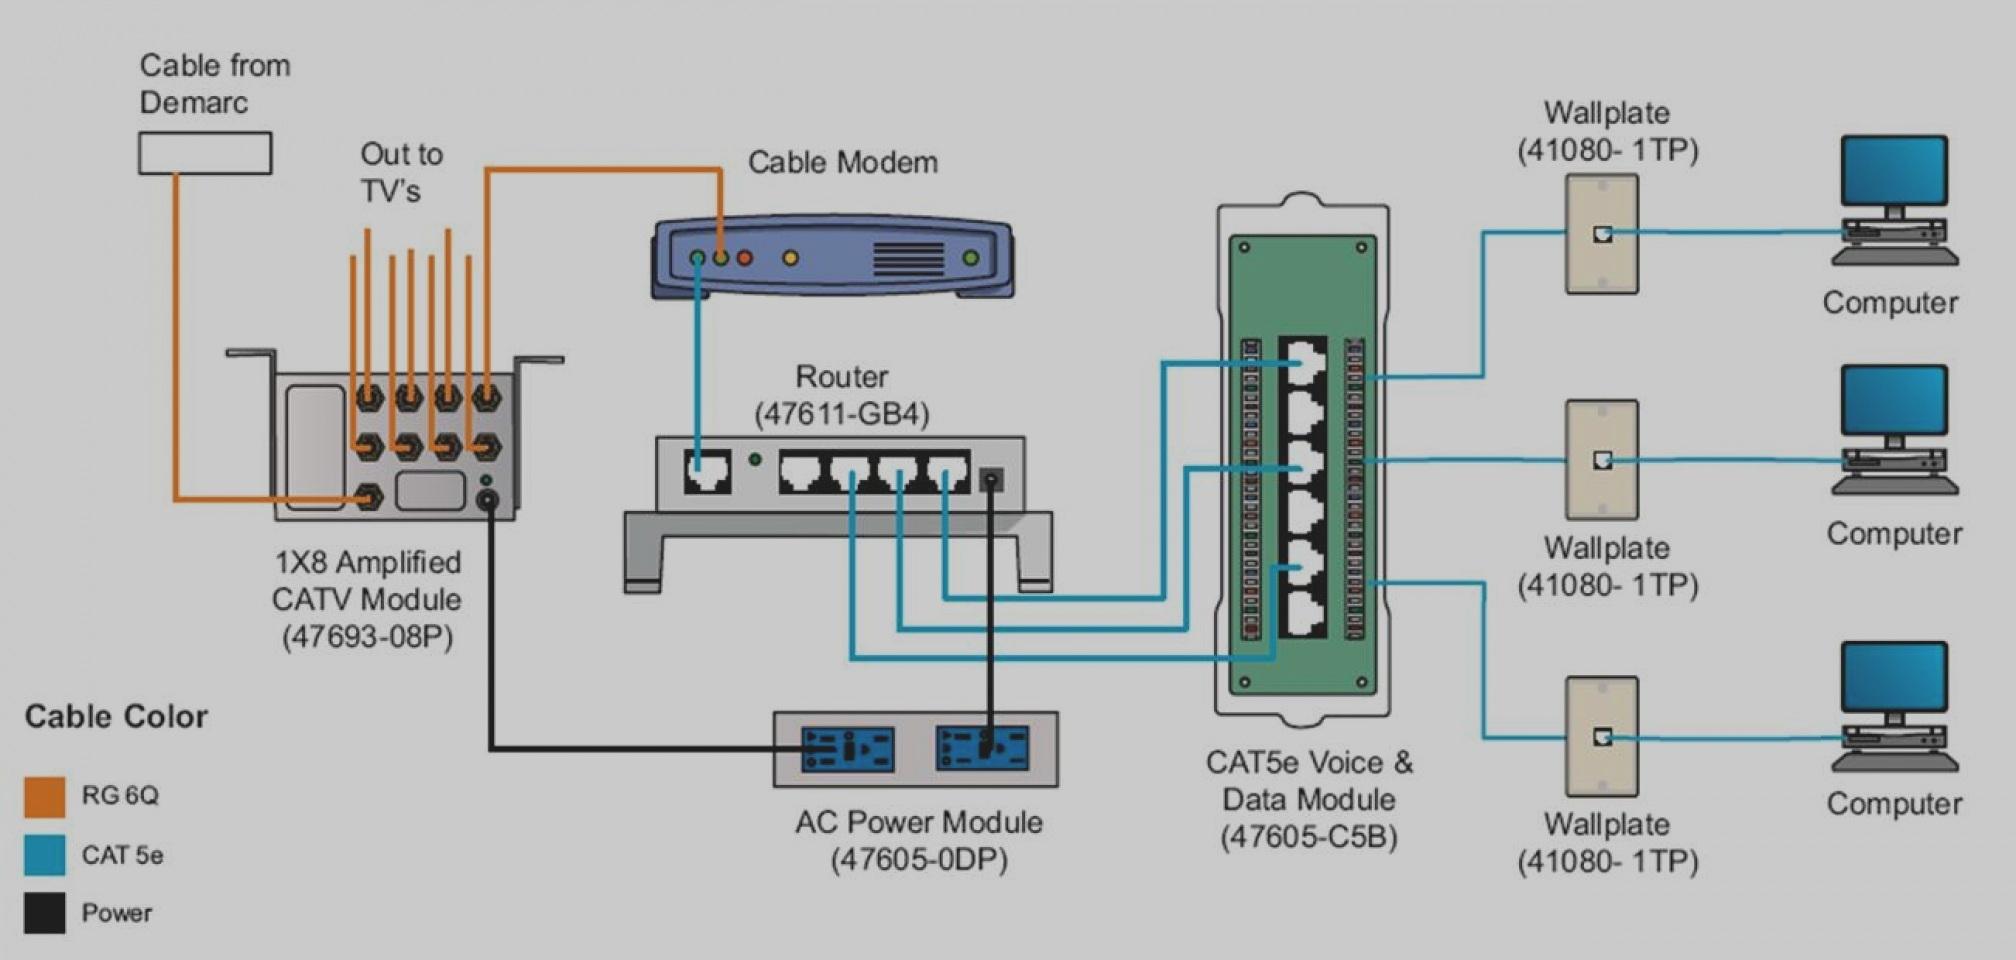 Leviton Cat 6 Wiring Diagram - Wiring Diagram Article on